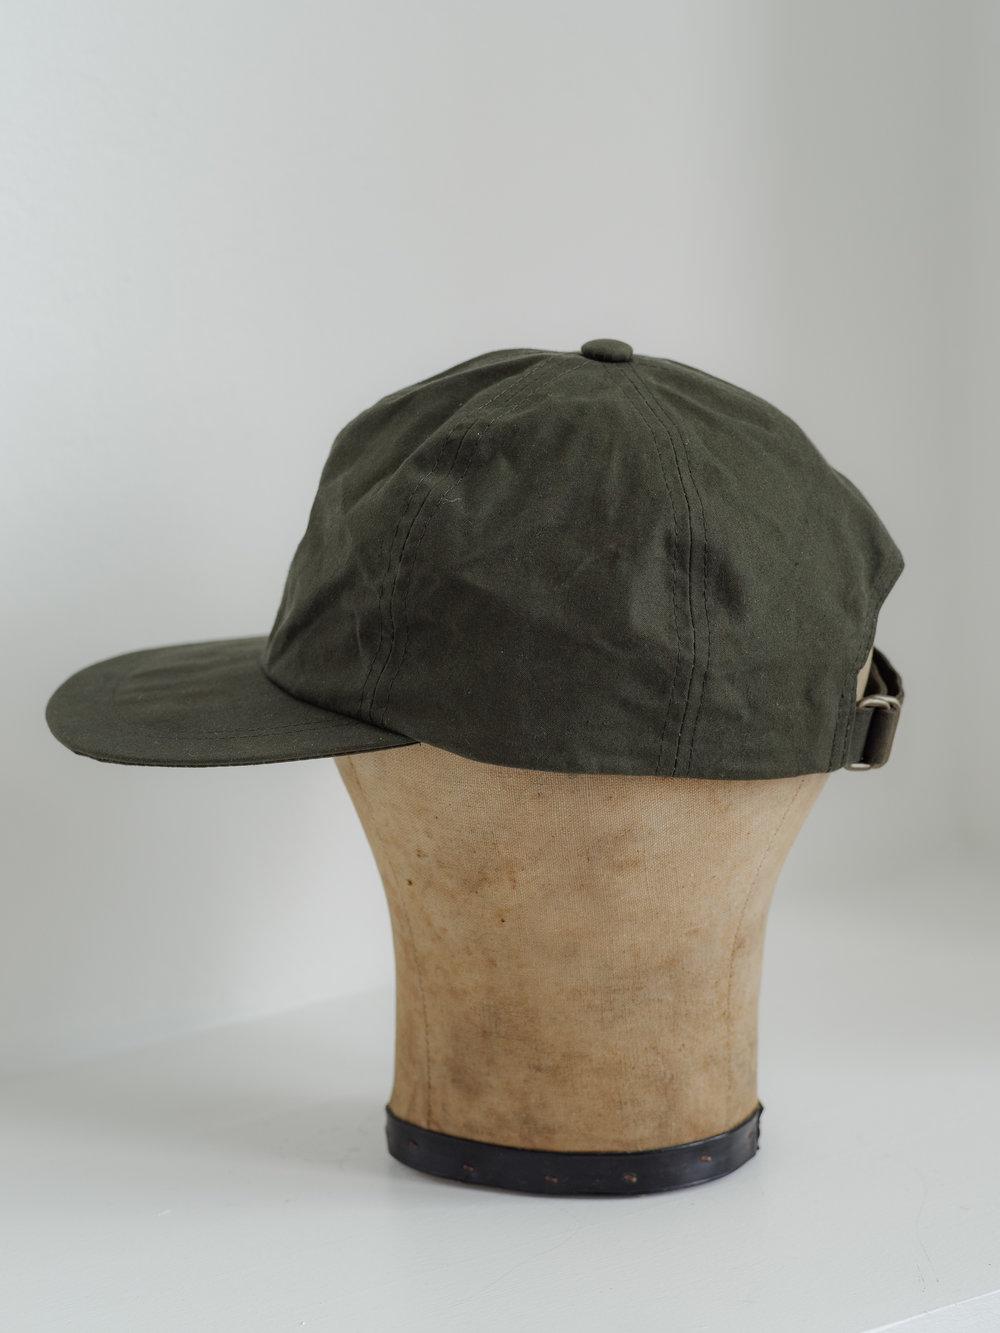 evan-kinori-ouji-yamada-handmade-hat-3